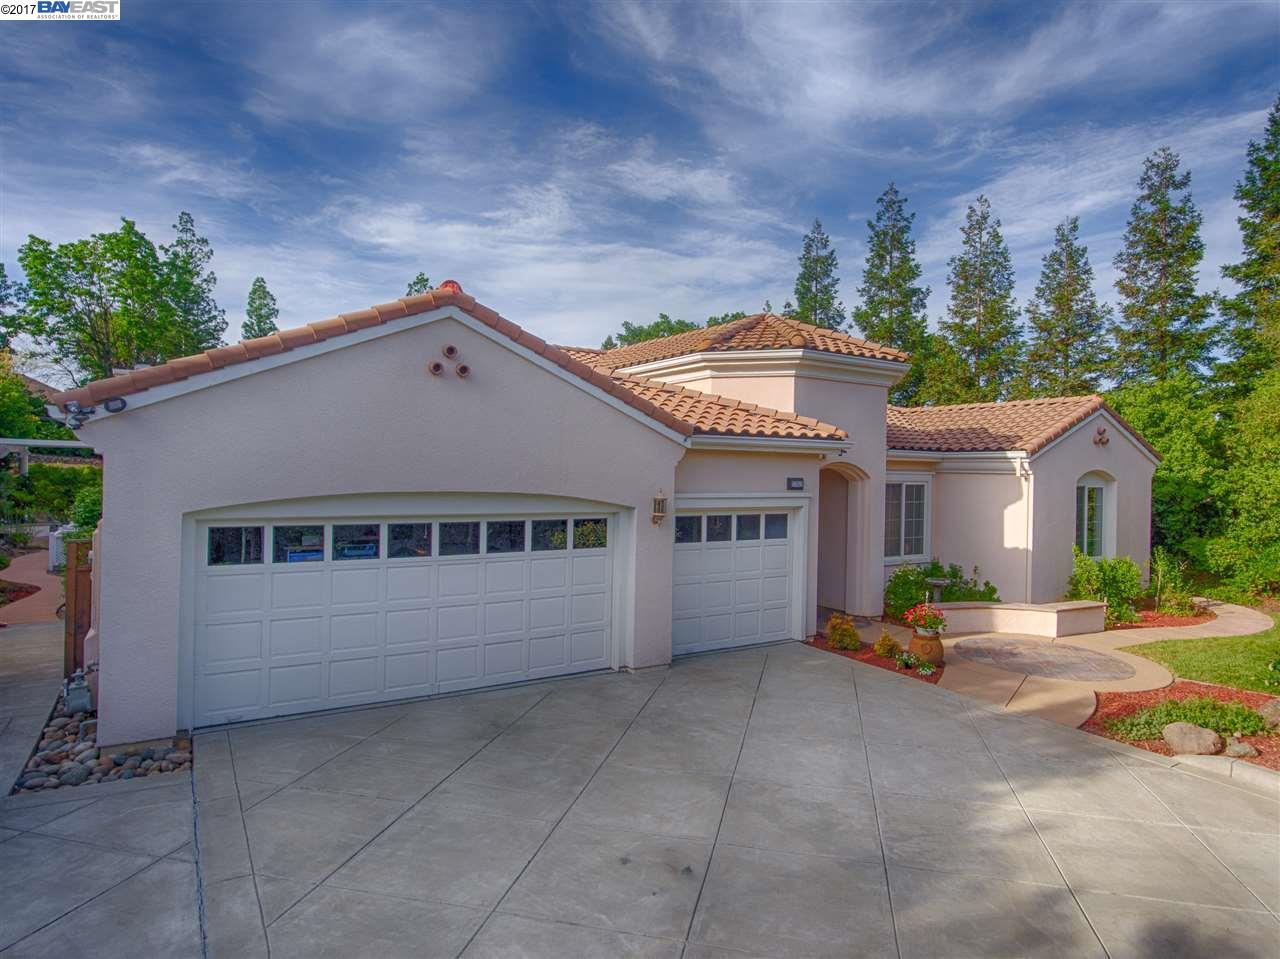 Single Family Home for Sale at 5763 Shadow Ridge Court Pleasanton, California 94566 United States